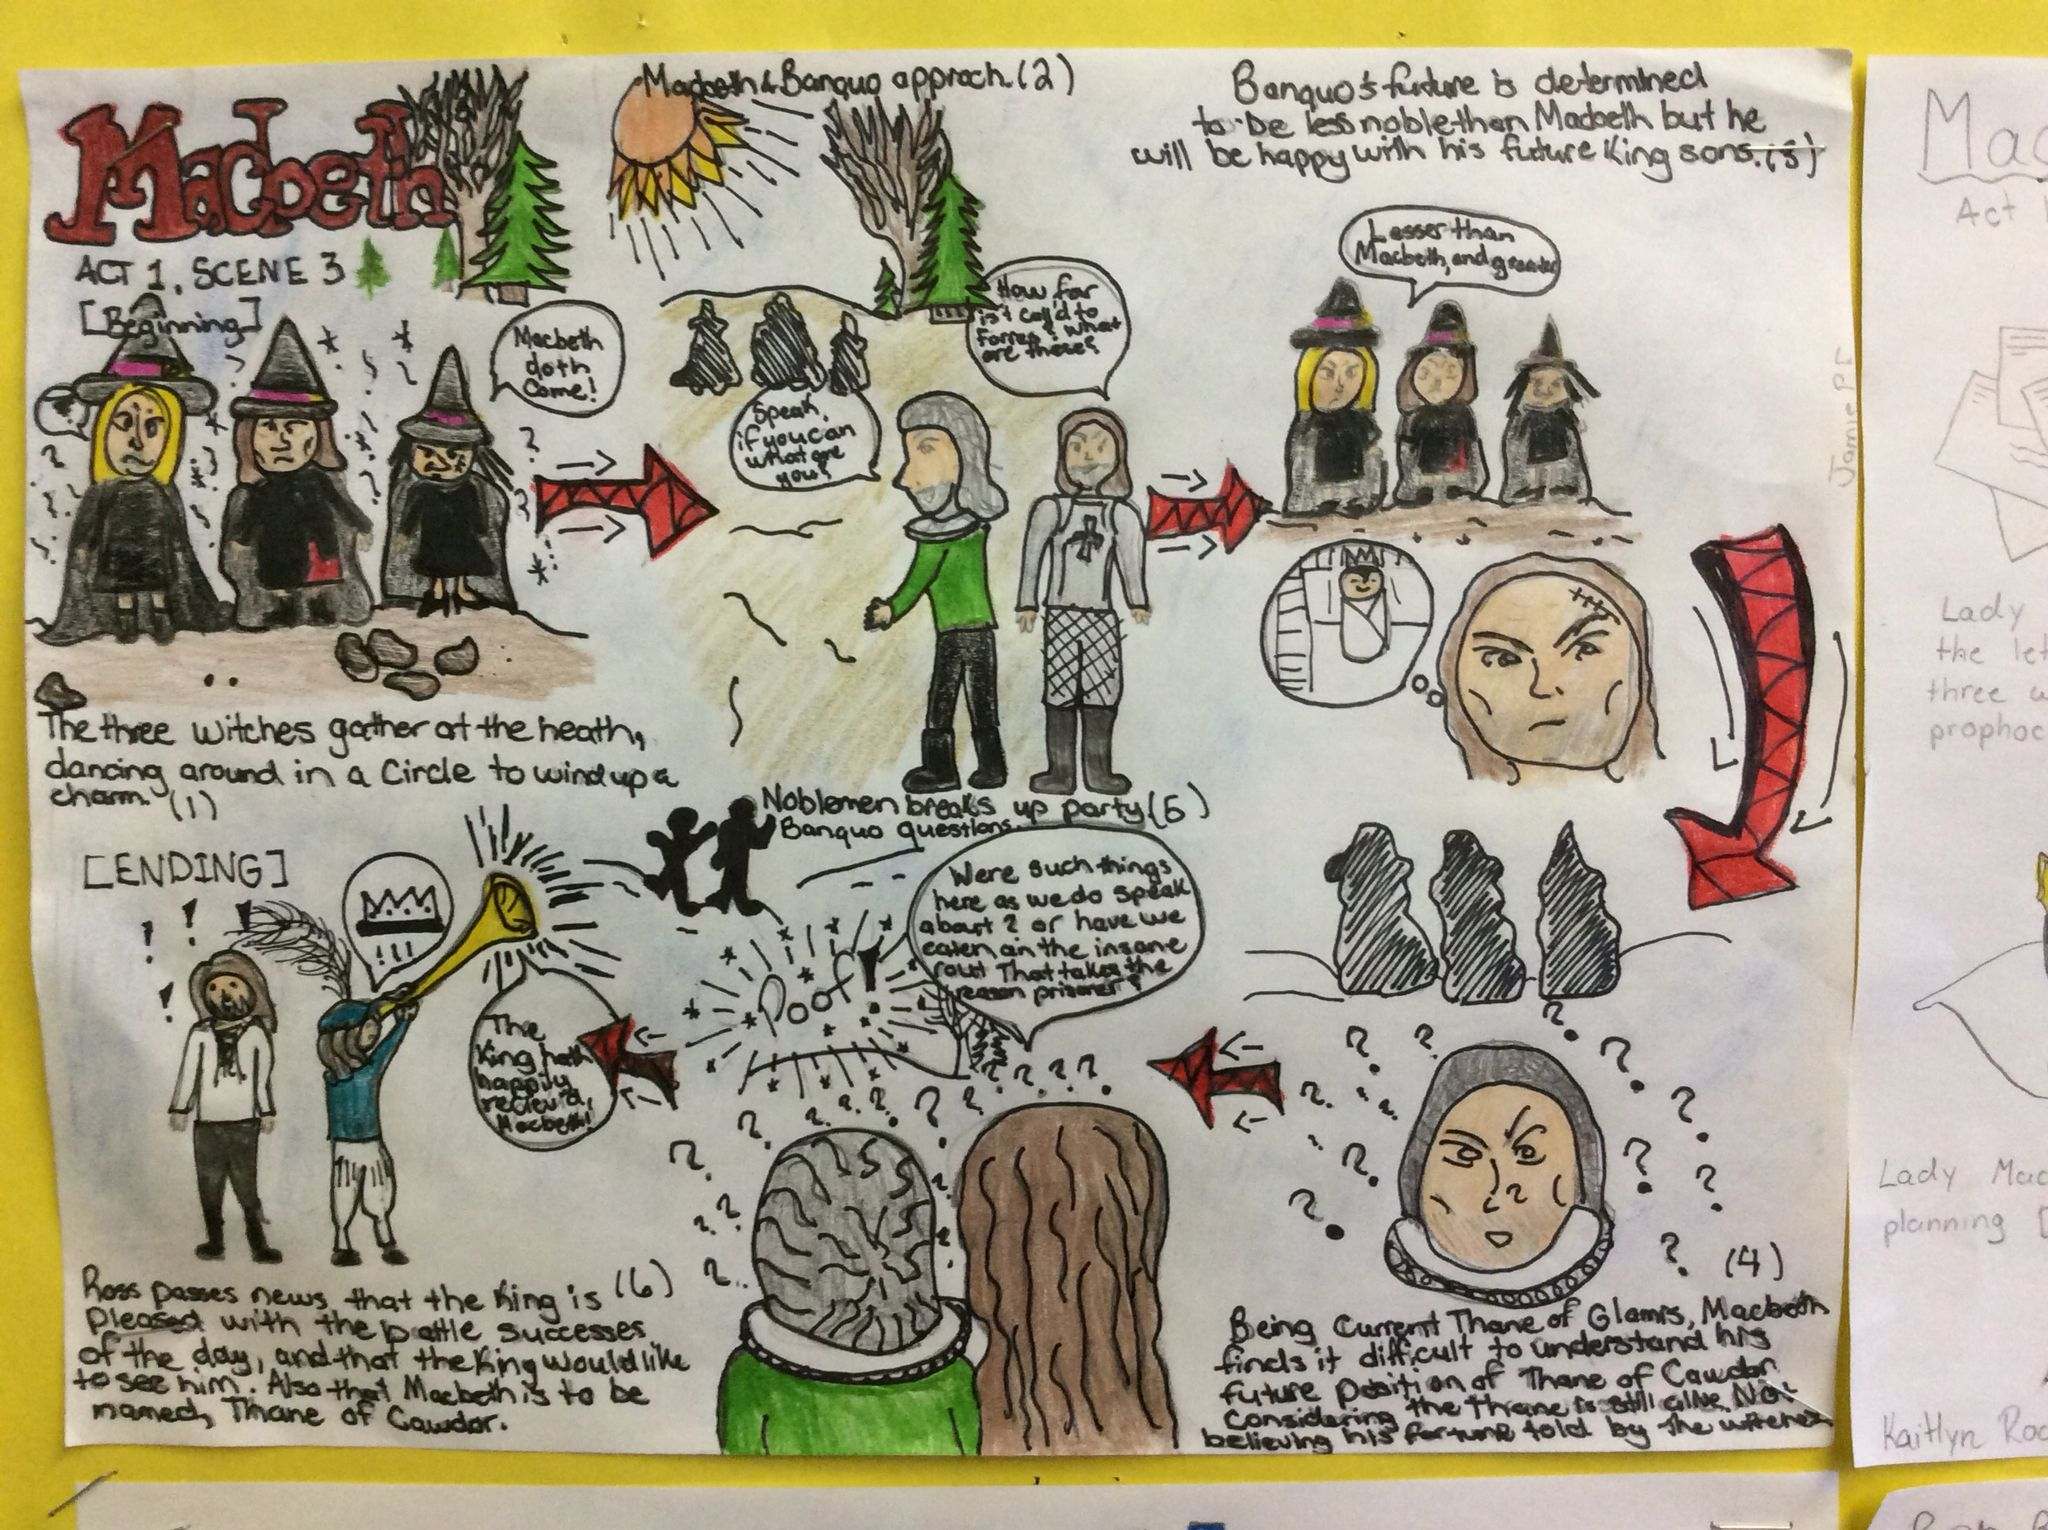 Pin By M J Jakubo On Macbeth Sketchnote Secondary Classroom School Level Education Act 3 Scene 1 Analysis